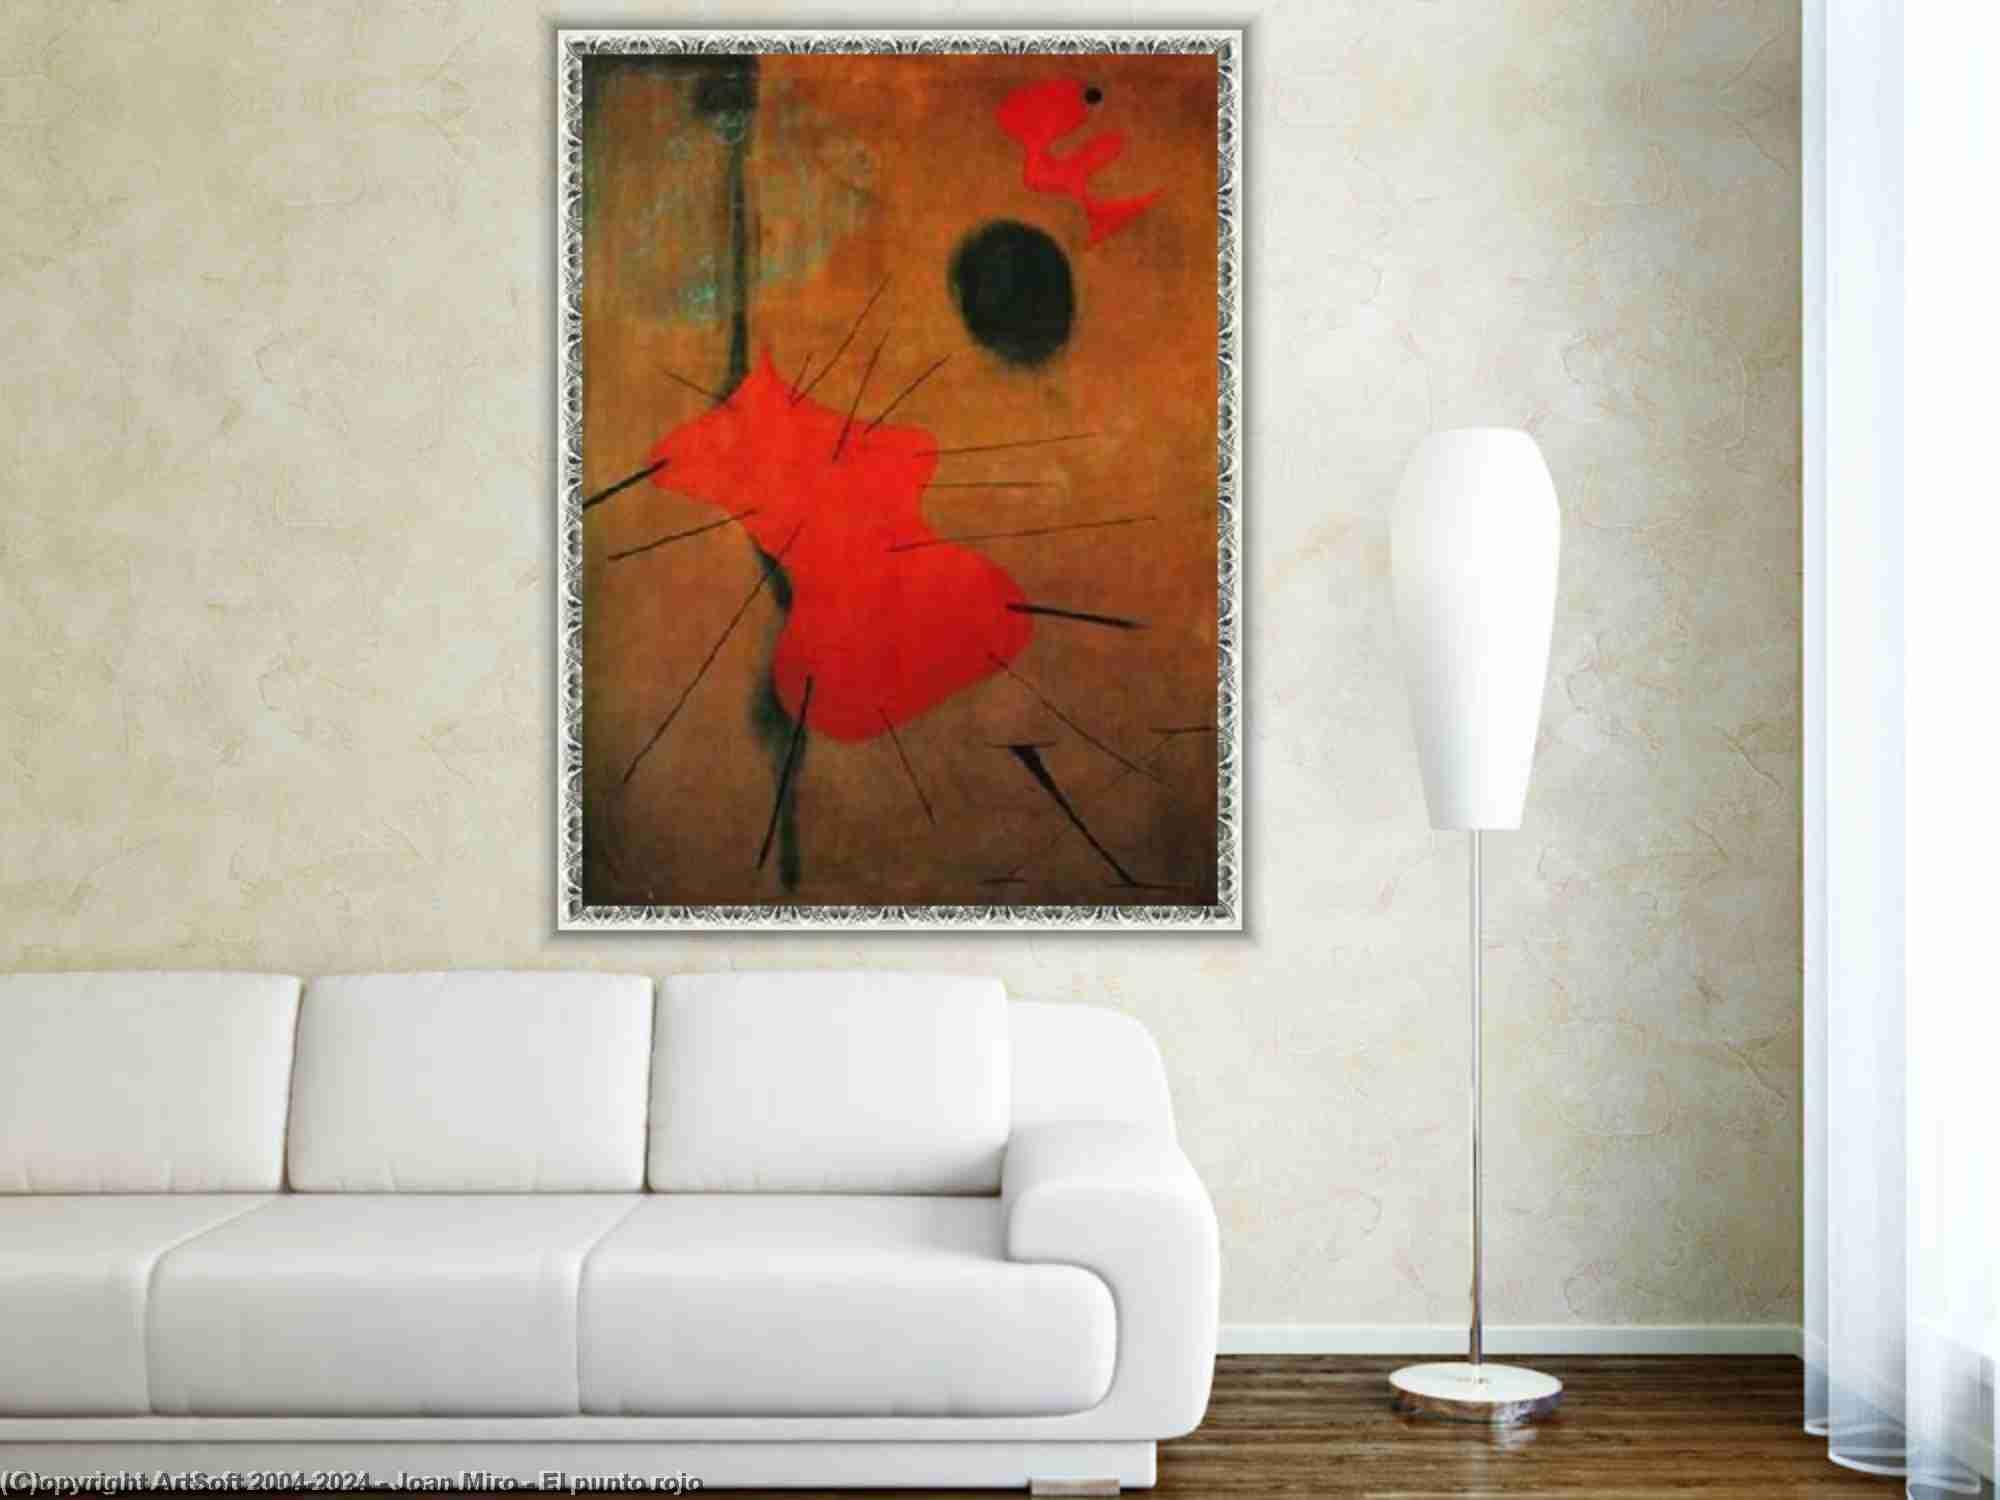 Joan Miro - El punto rojo